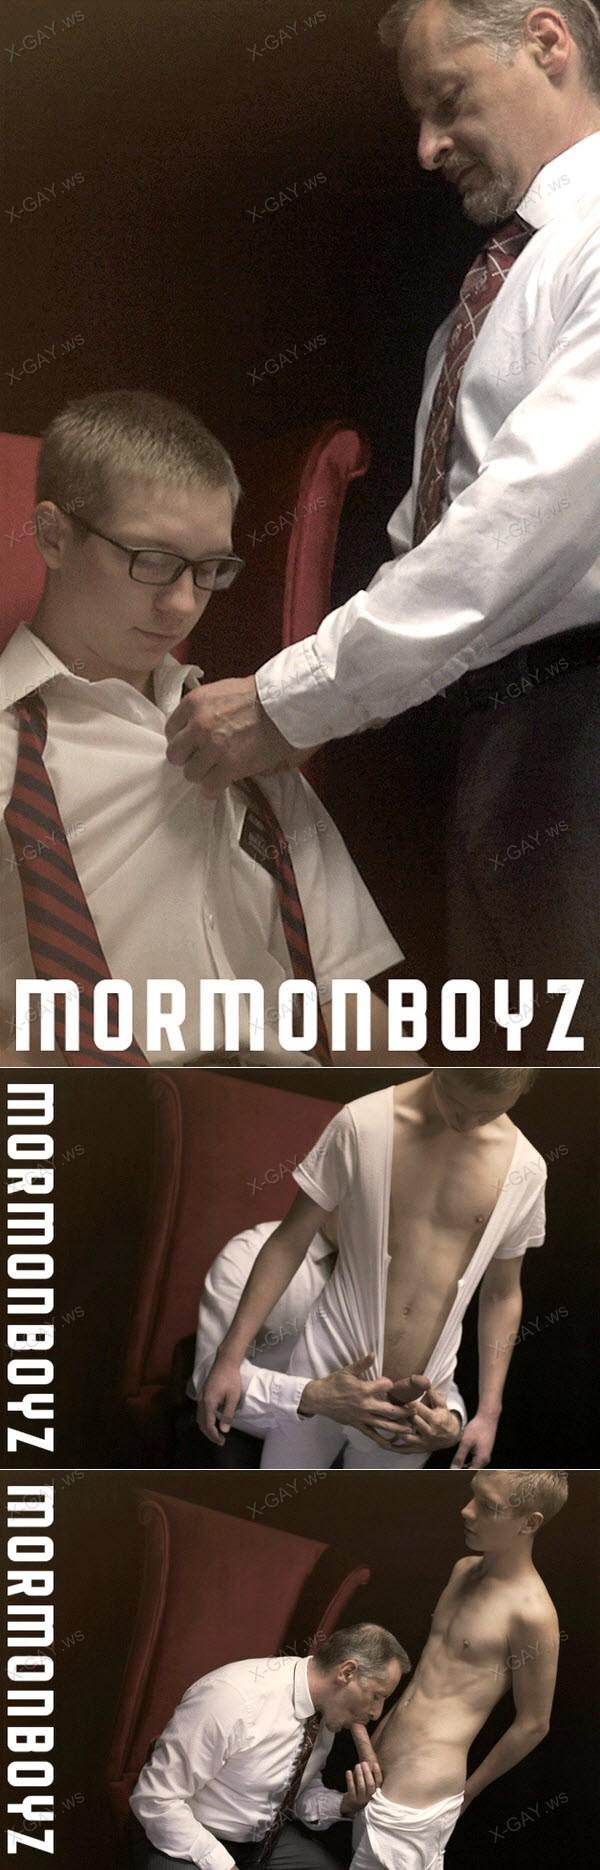 MormonBoyz: Elder Stewart, Disciplinary Action